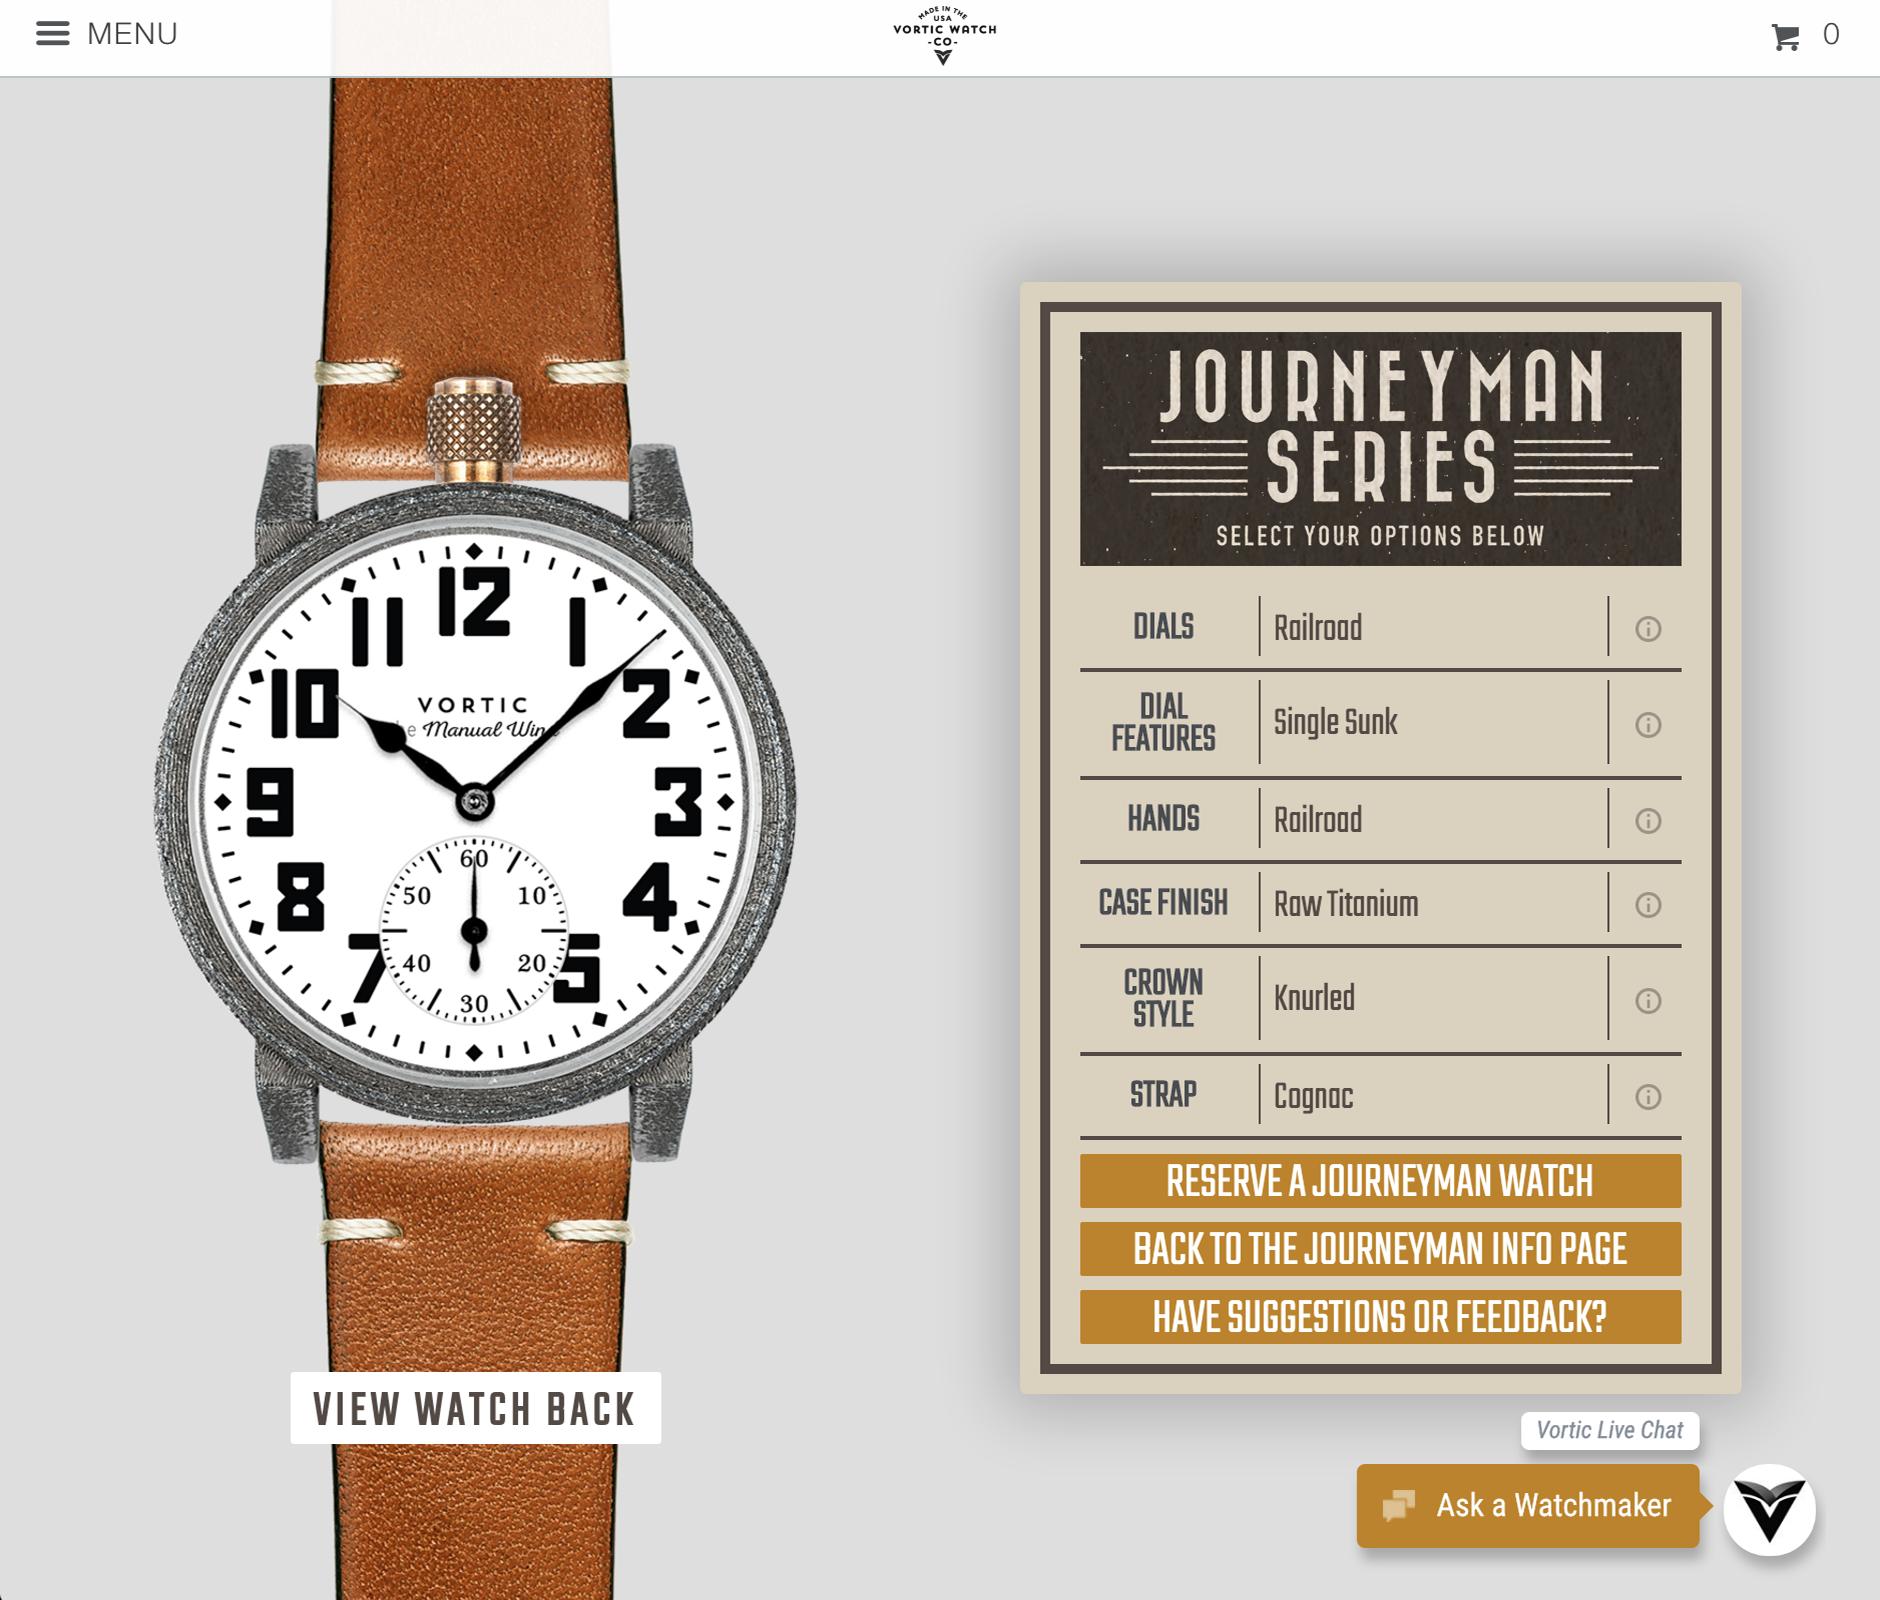 Vortic Watch Builder Journeyman Series.png